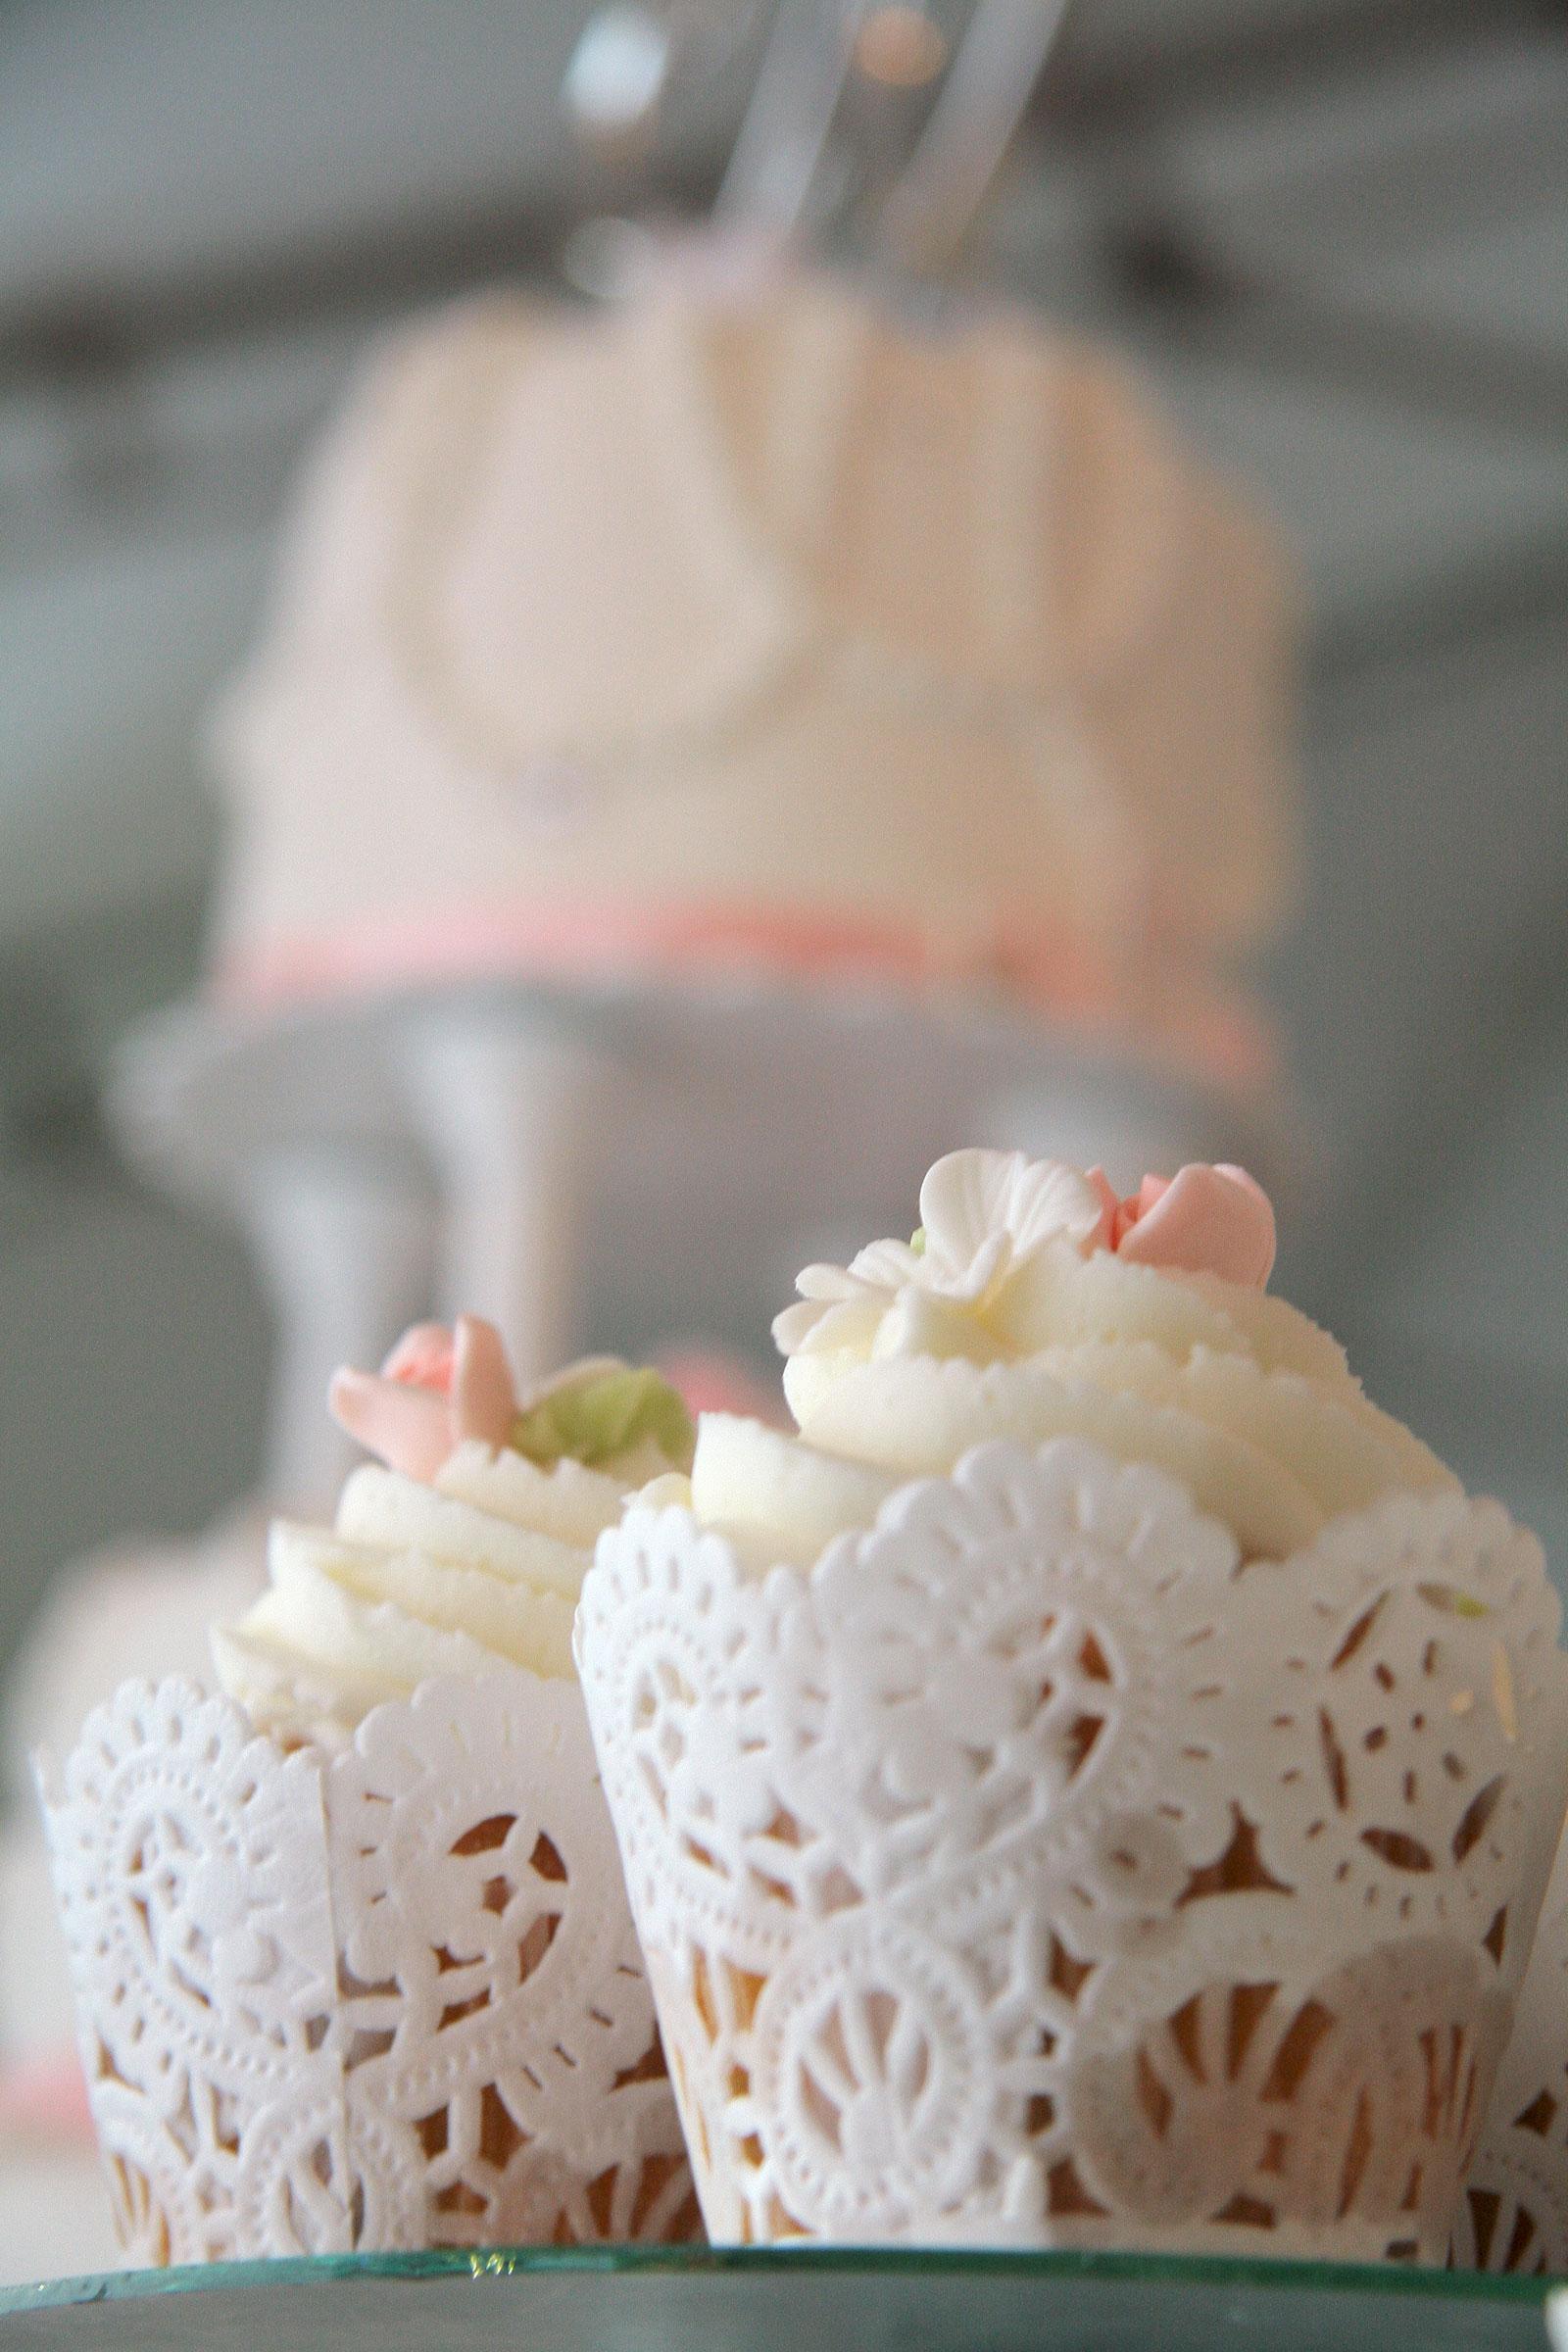 Cupcakes_3392.jpg